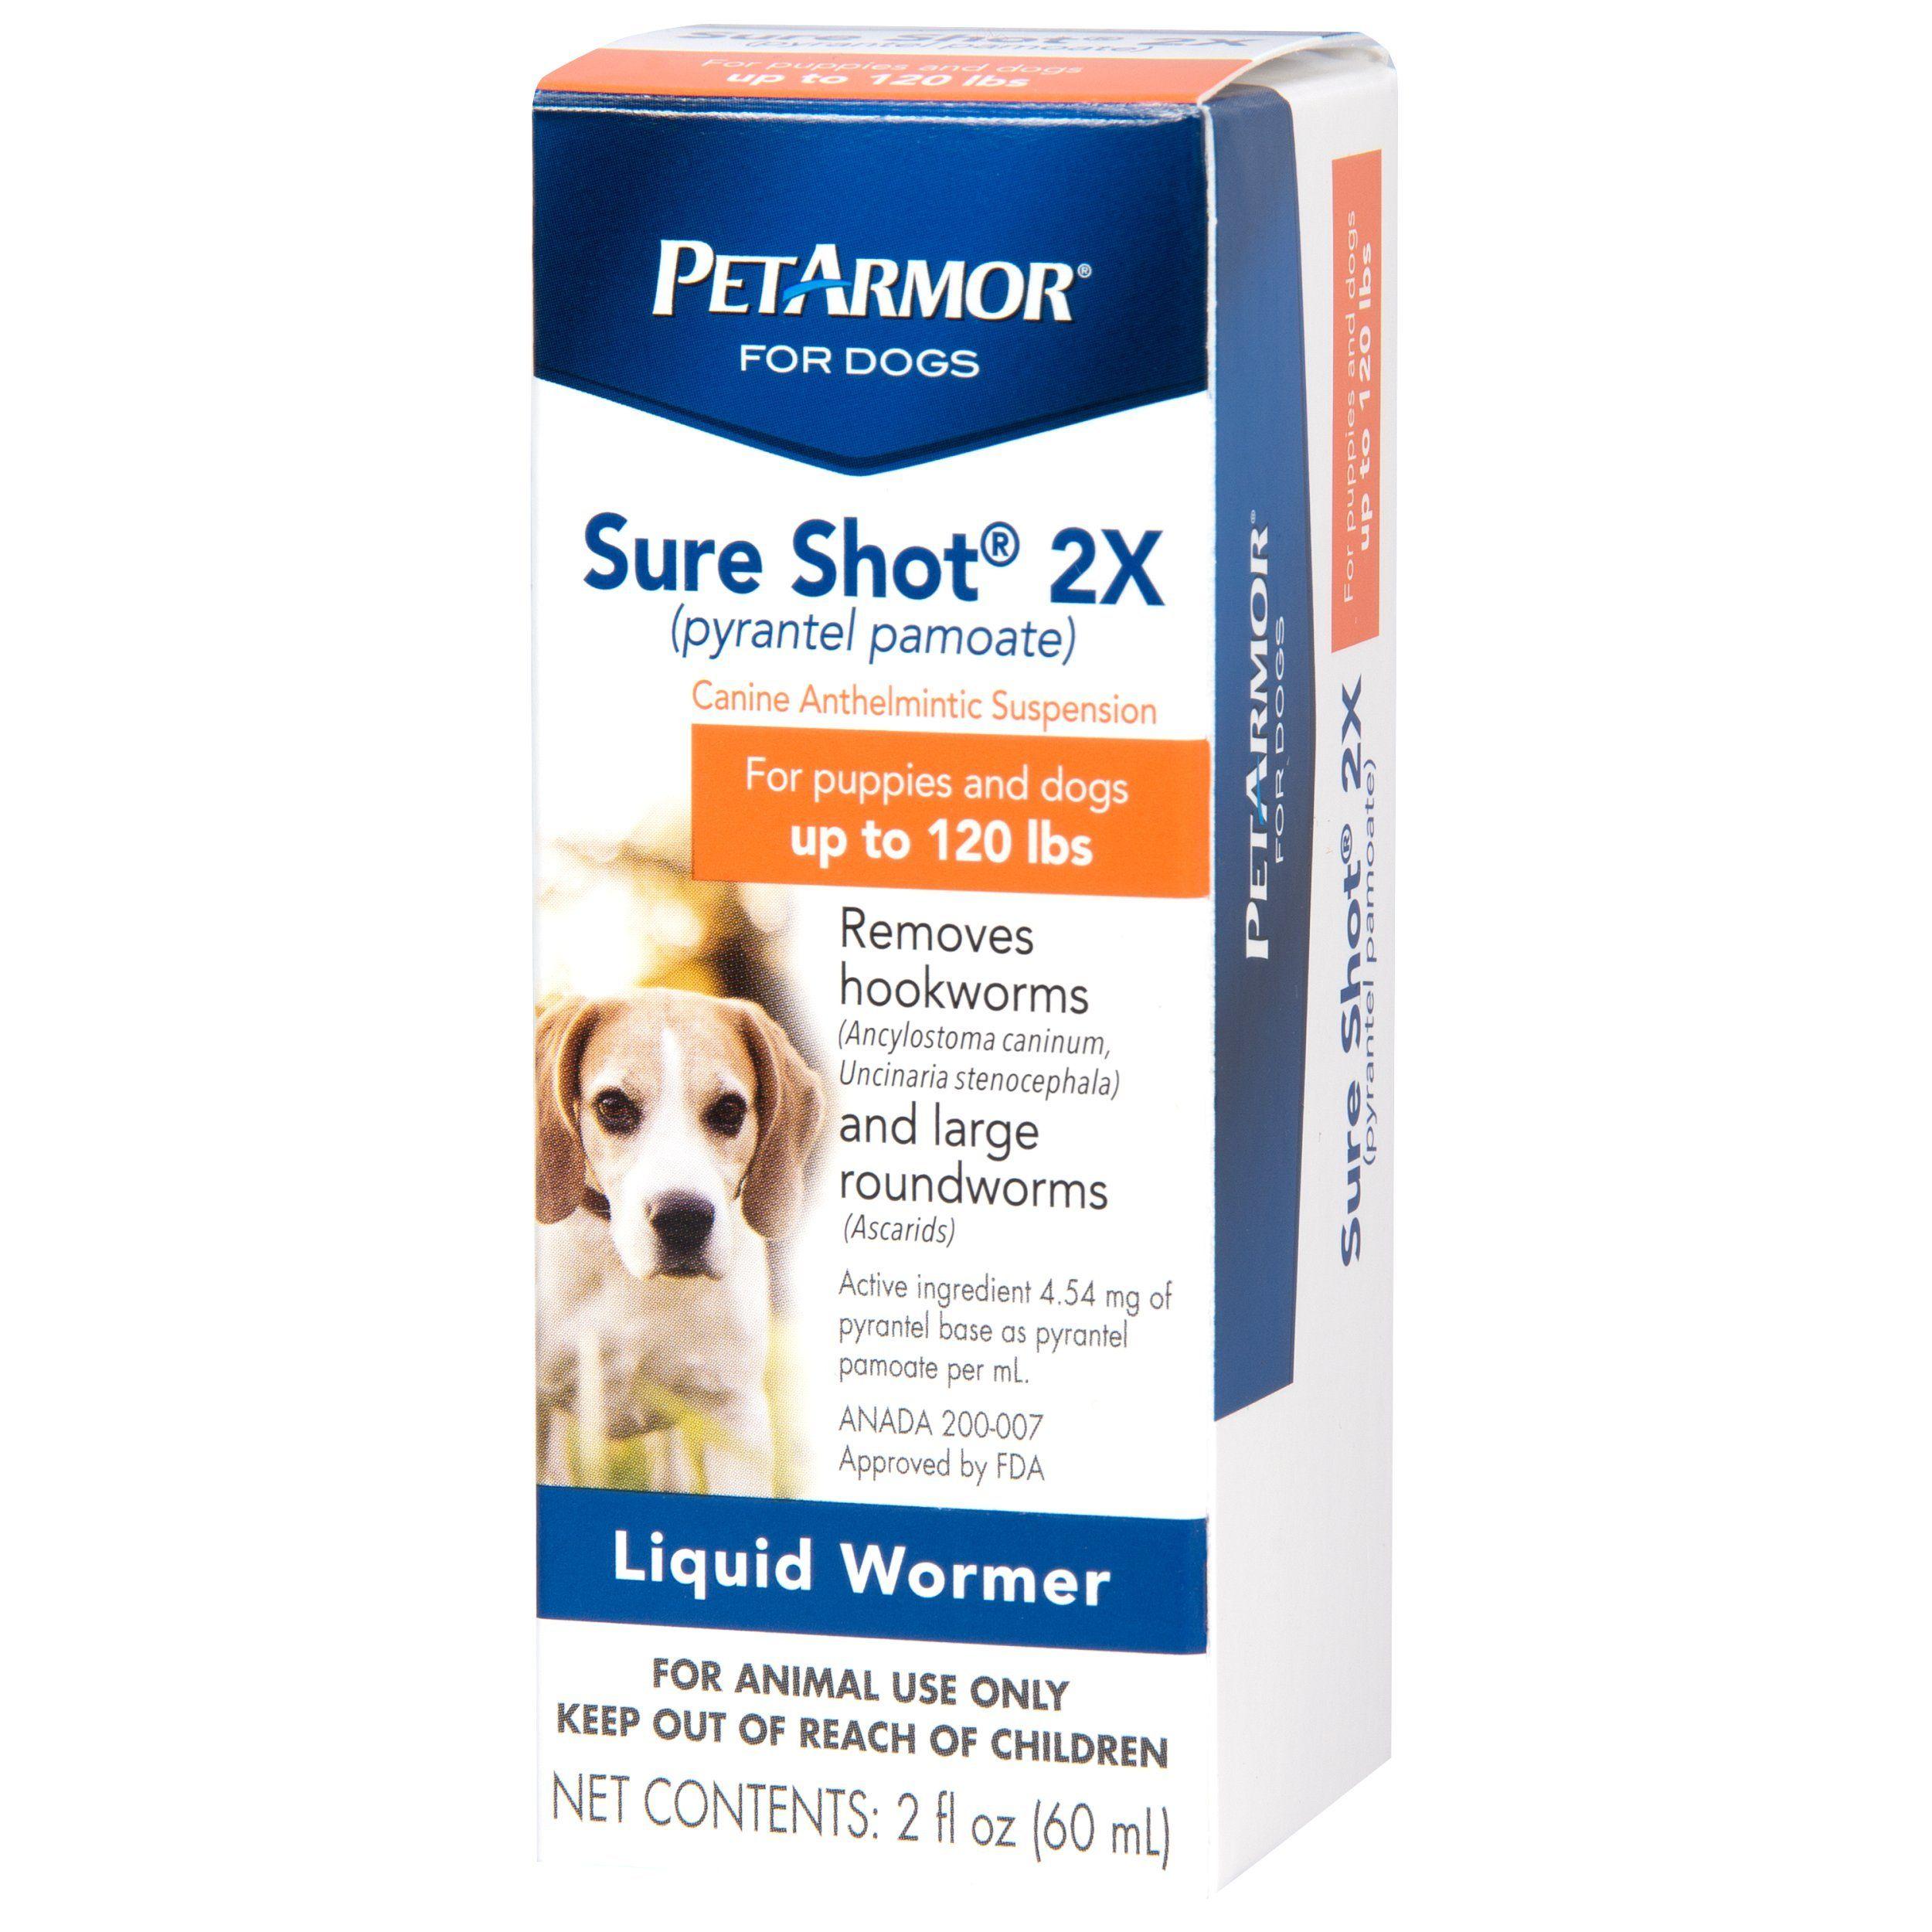 Petarmor Sure Shot 2x Pyrantel Pamoate Liquid De Wormer Dogs 2